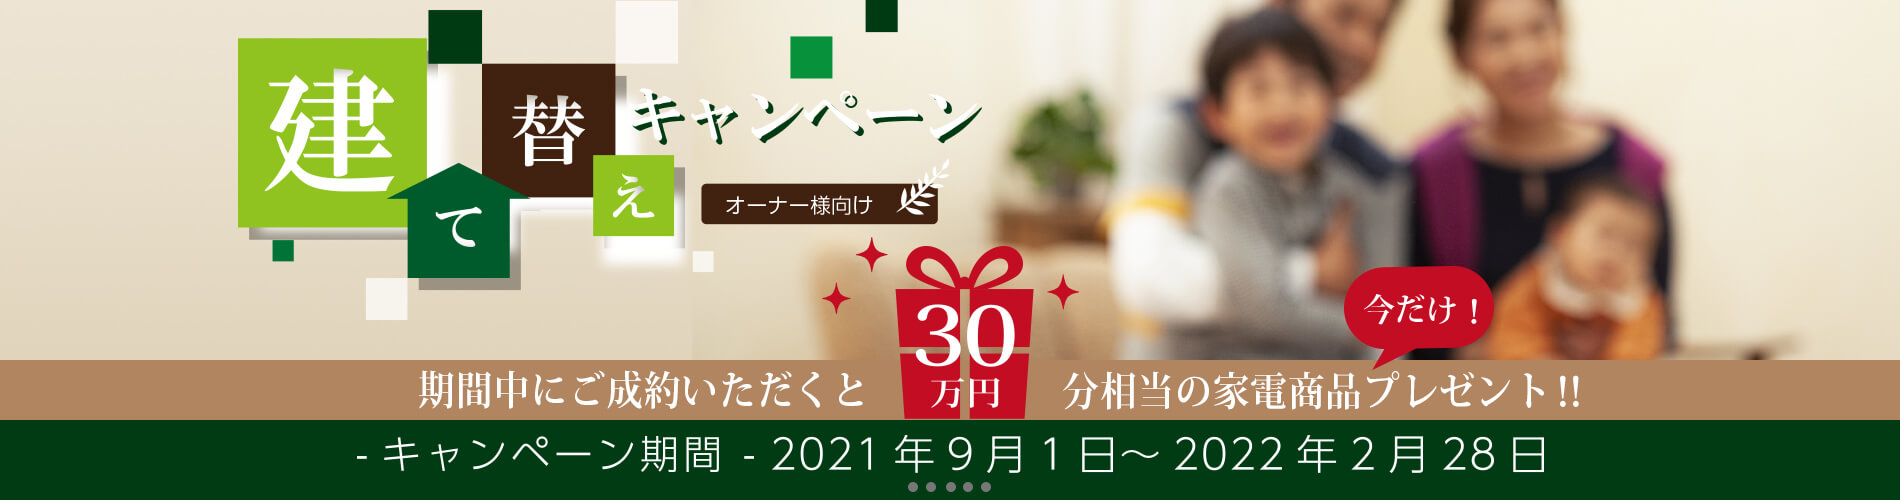 https://www.shikishima-j.co.jp/app-def/S-102/corporate/wp-content/uploads/2021/08/c_slider_pc-3.jpg